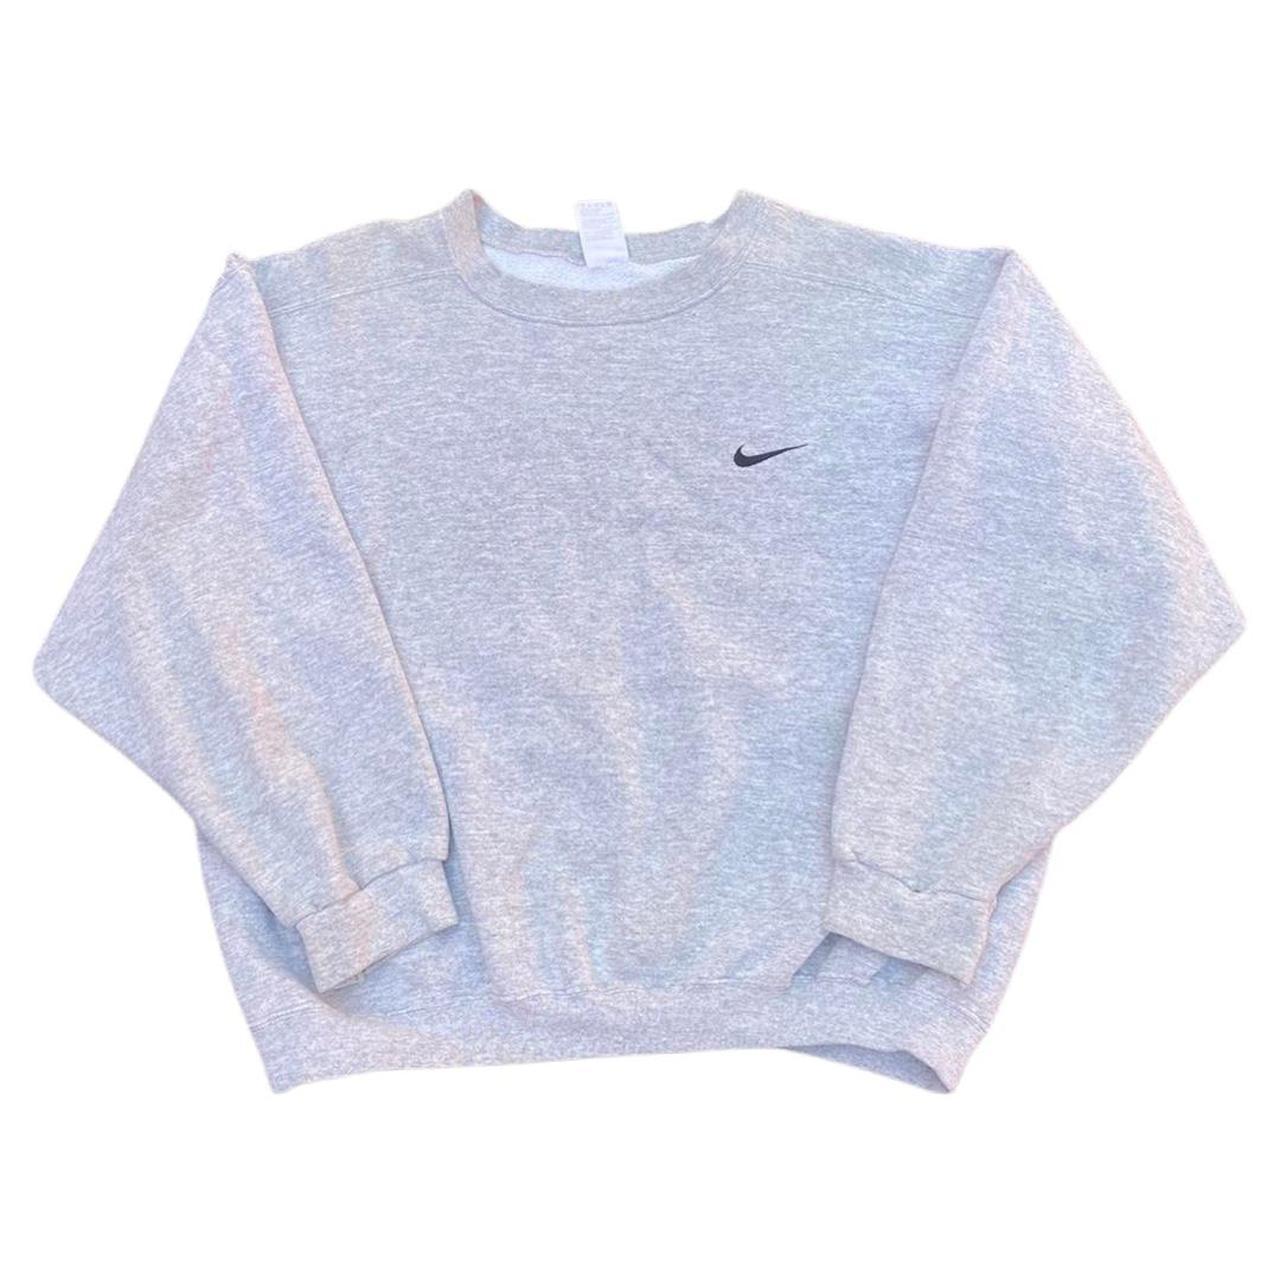 Product Image 1 - Vintage grey Nike sweater 25x24✔️  •